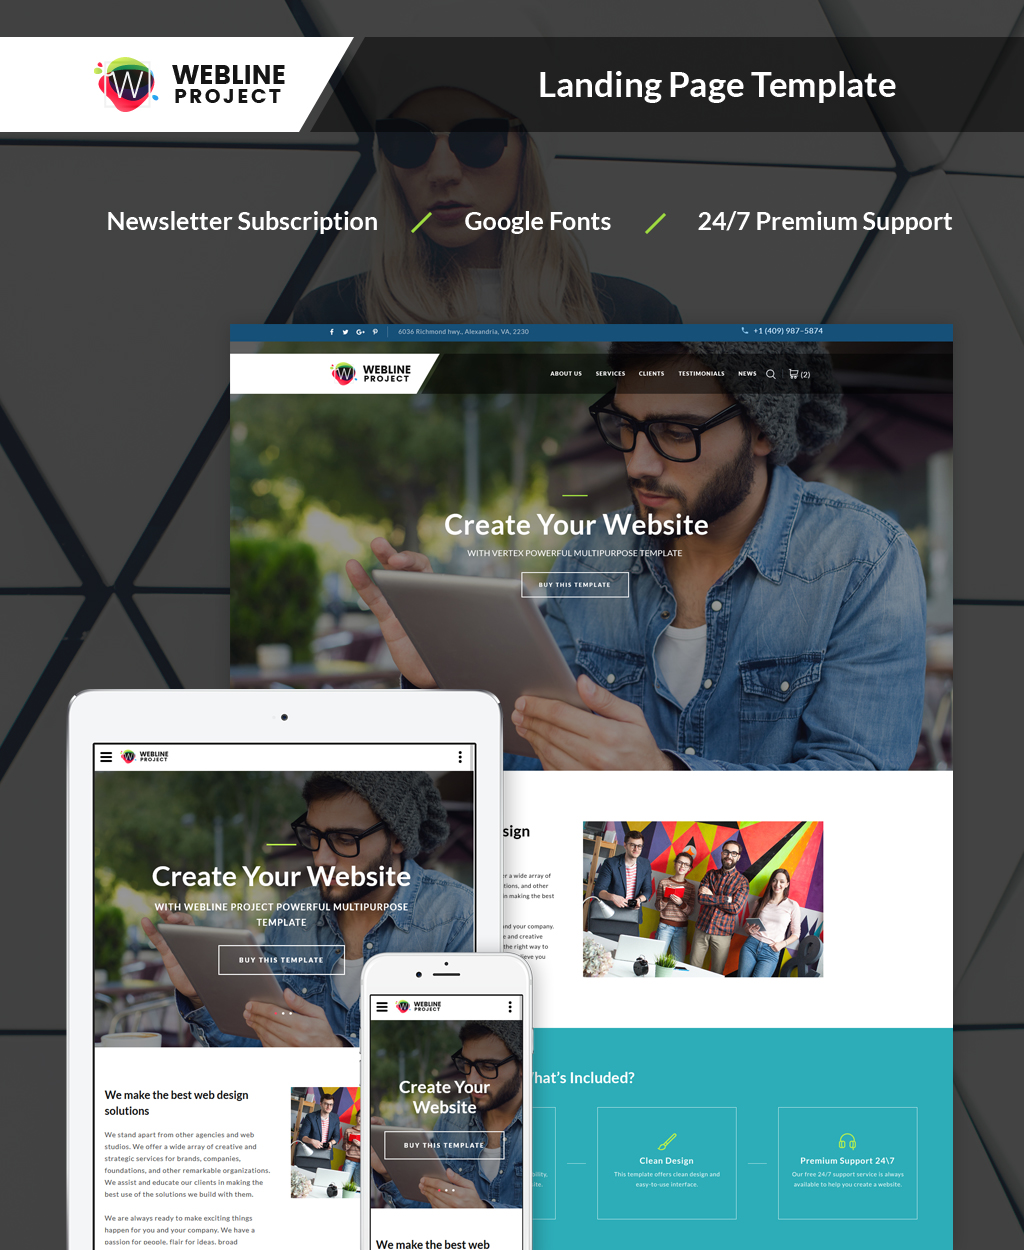 Webline Project - Corporate Landing Page Template - screenshot